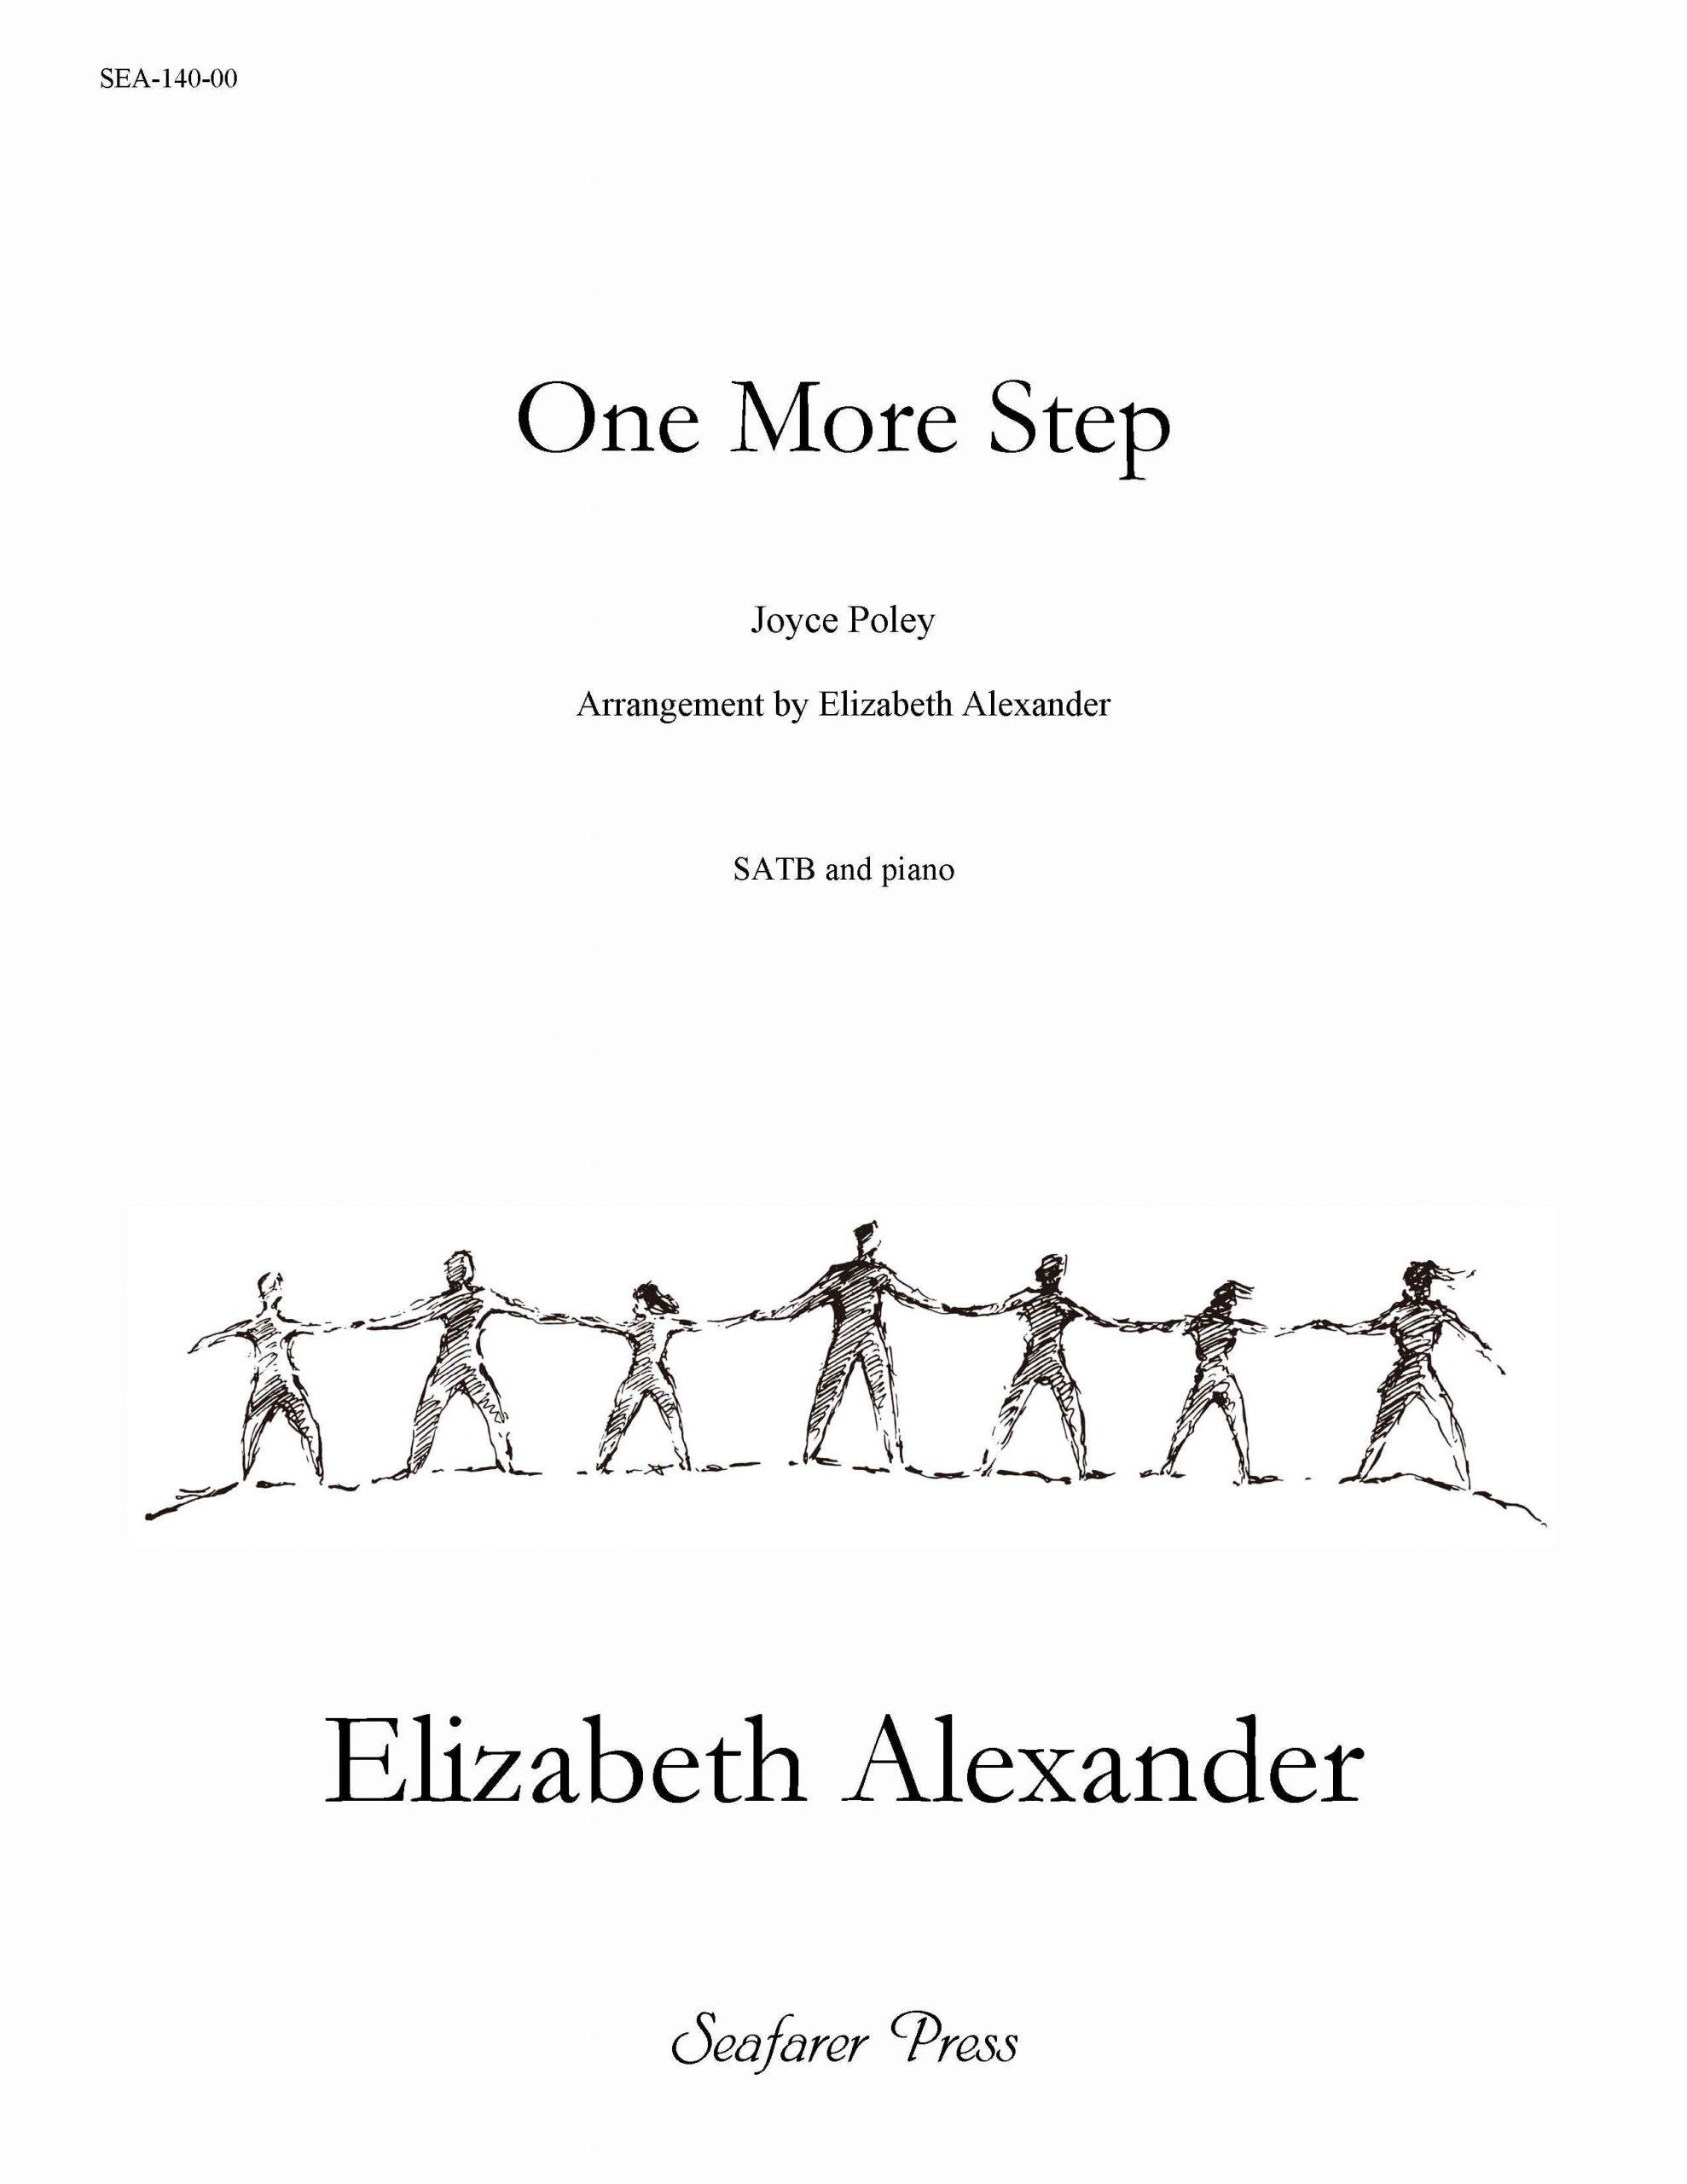 SEA-140-00 - One More Step